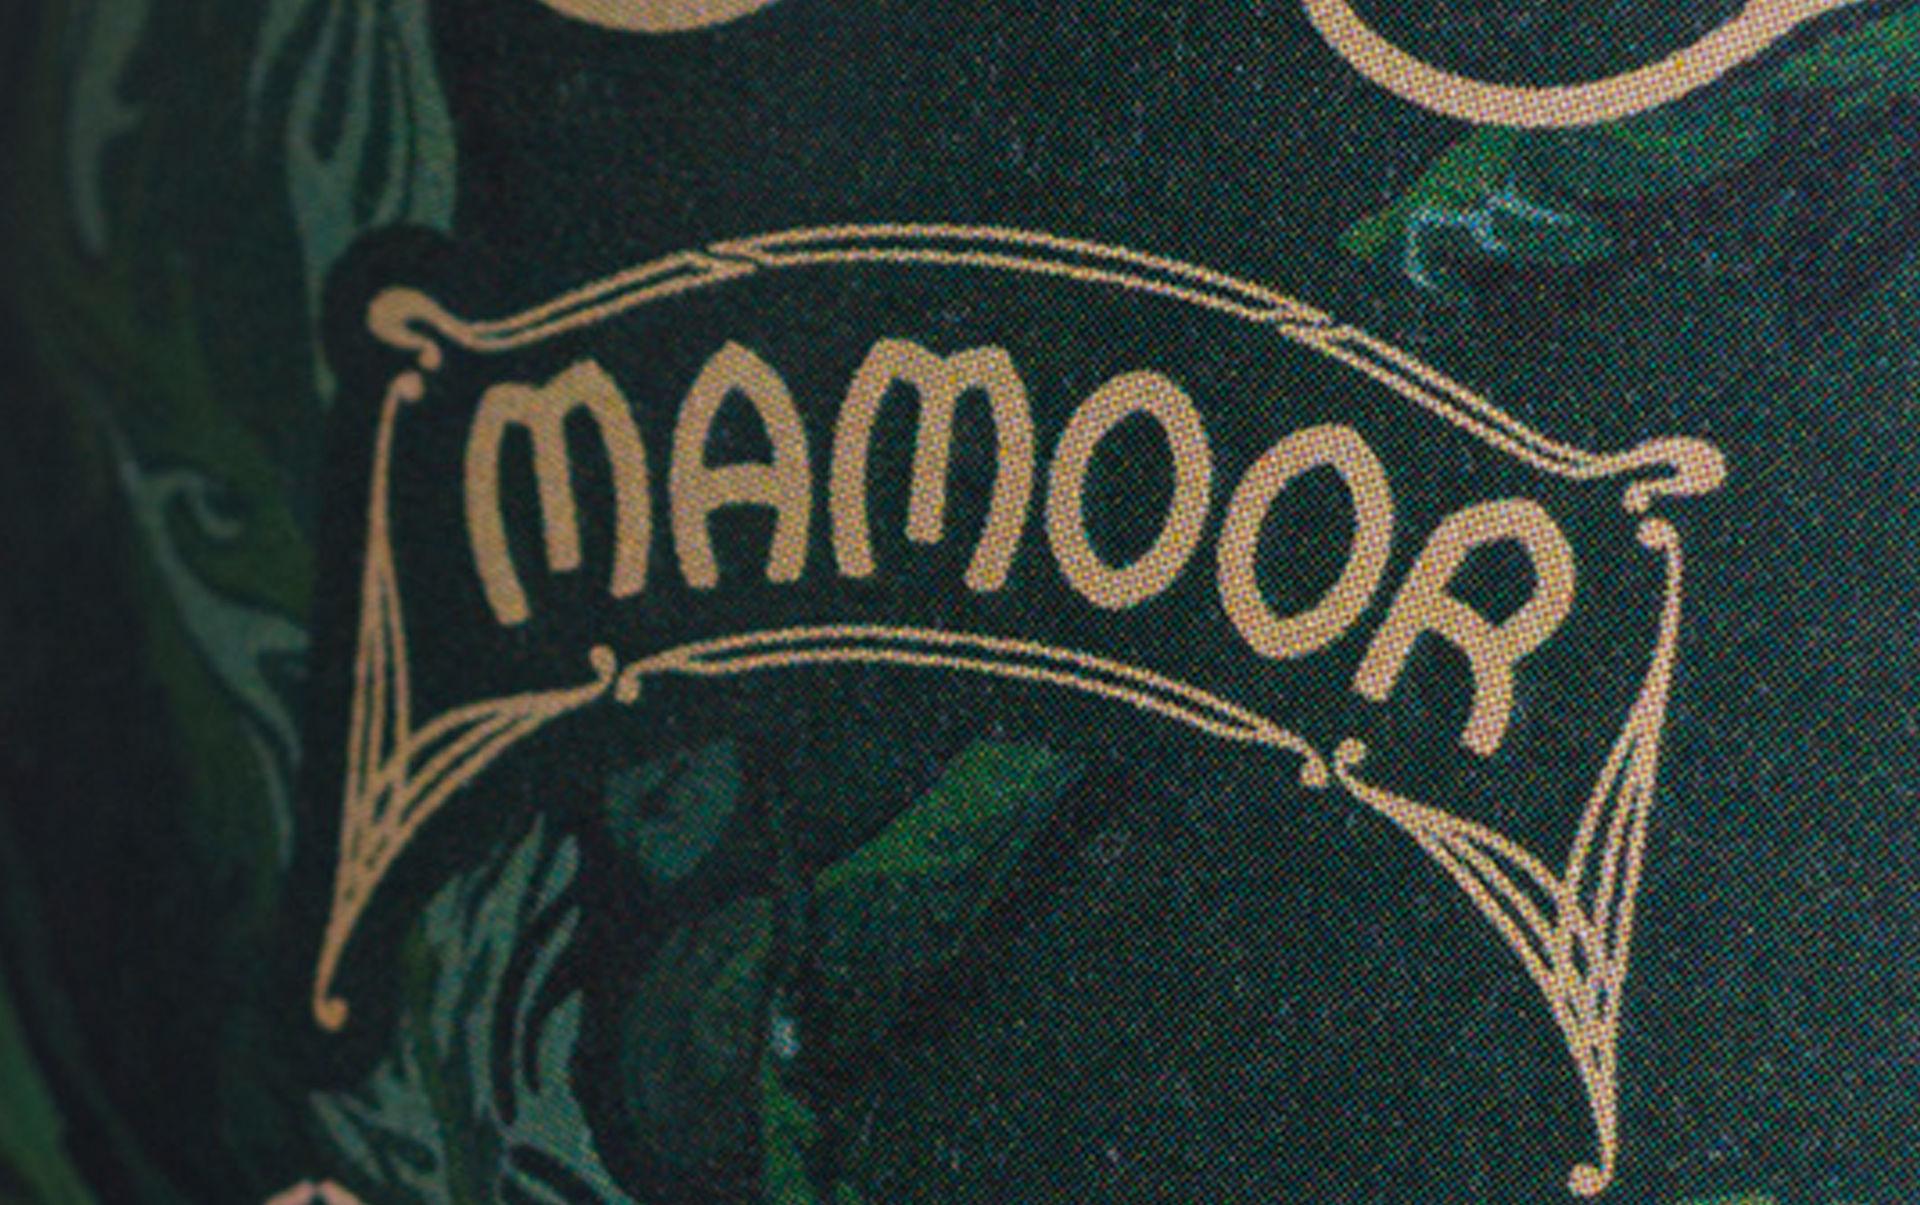 Mamoor